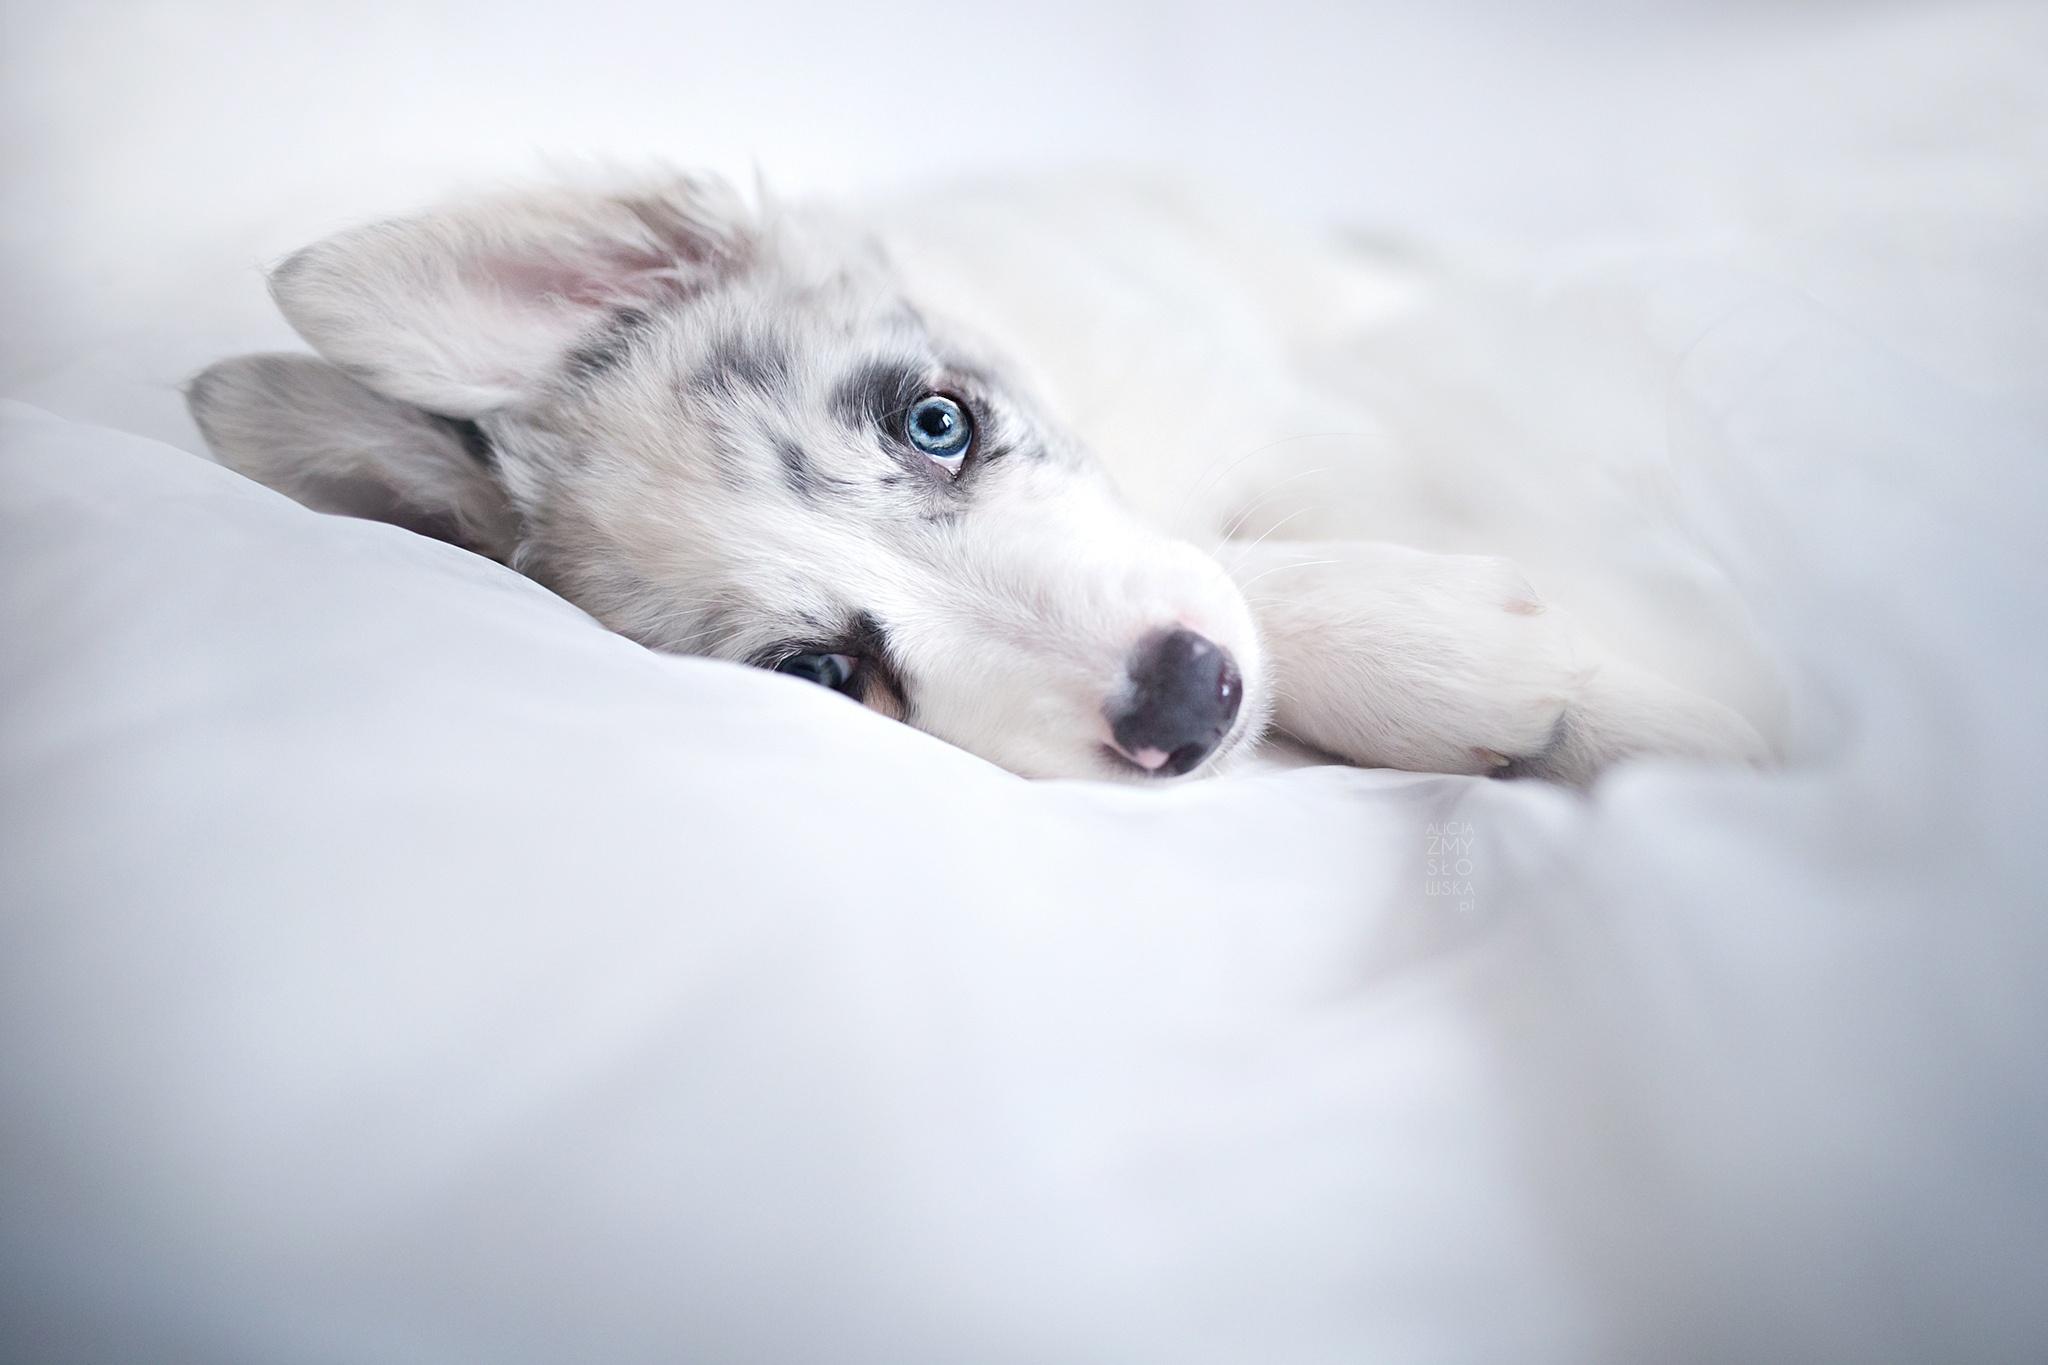 Dog Pet Baby Animal 2048x1365